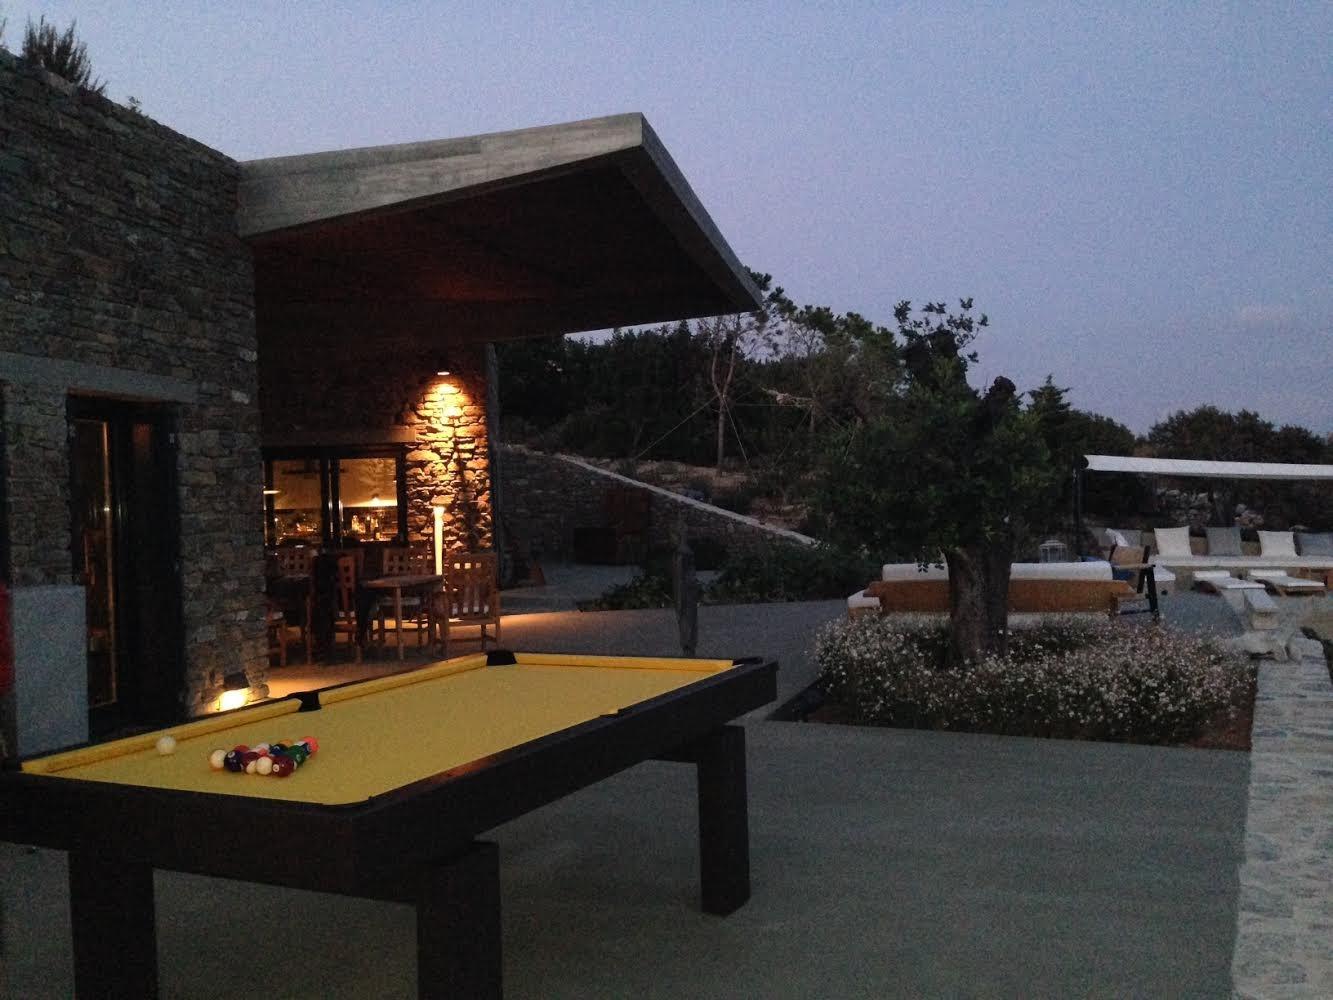 South Beach custom outdoor pool table in Greece